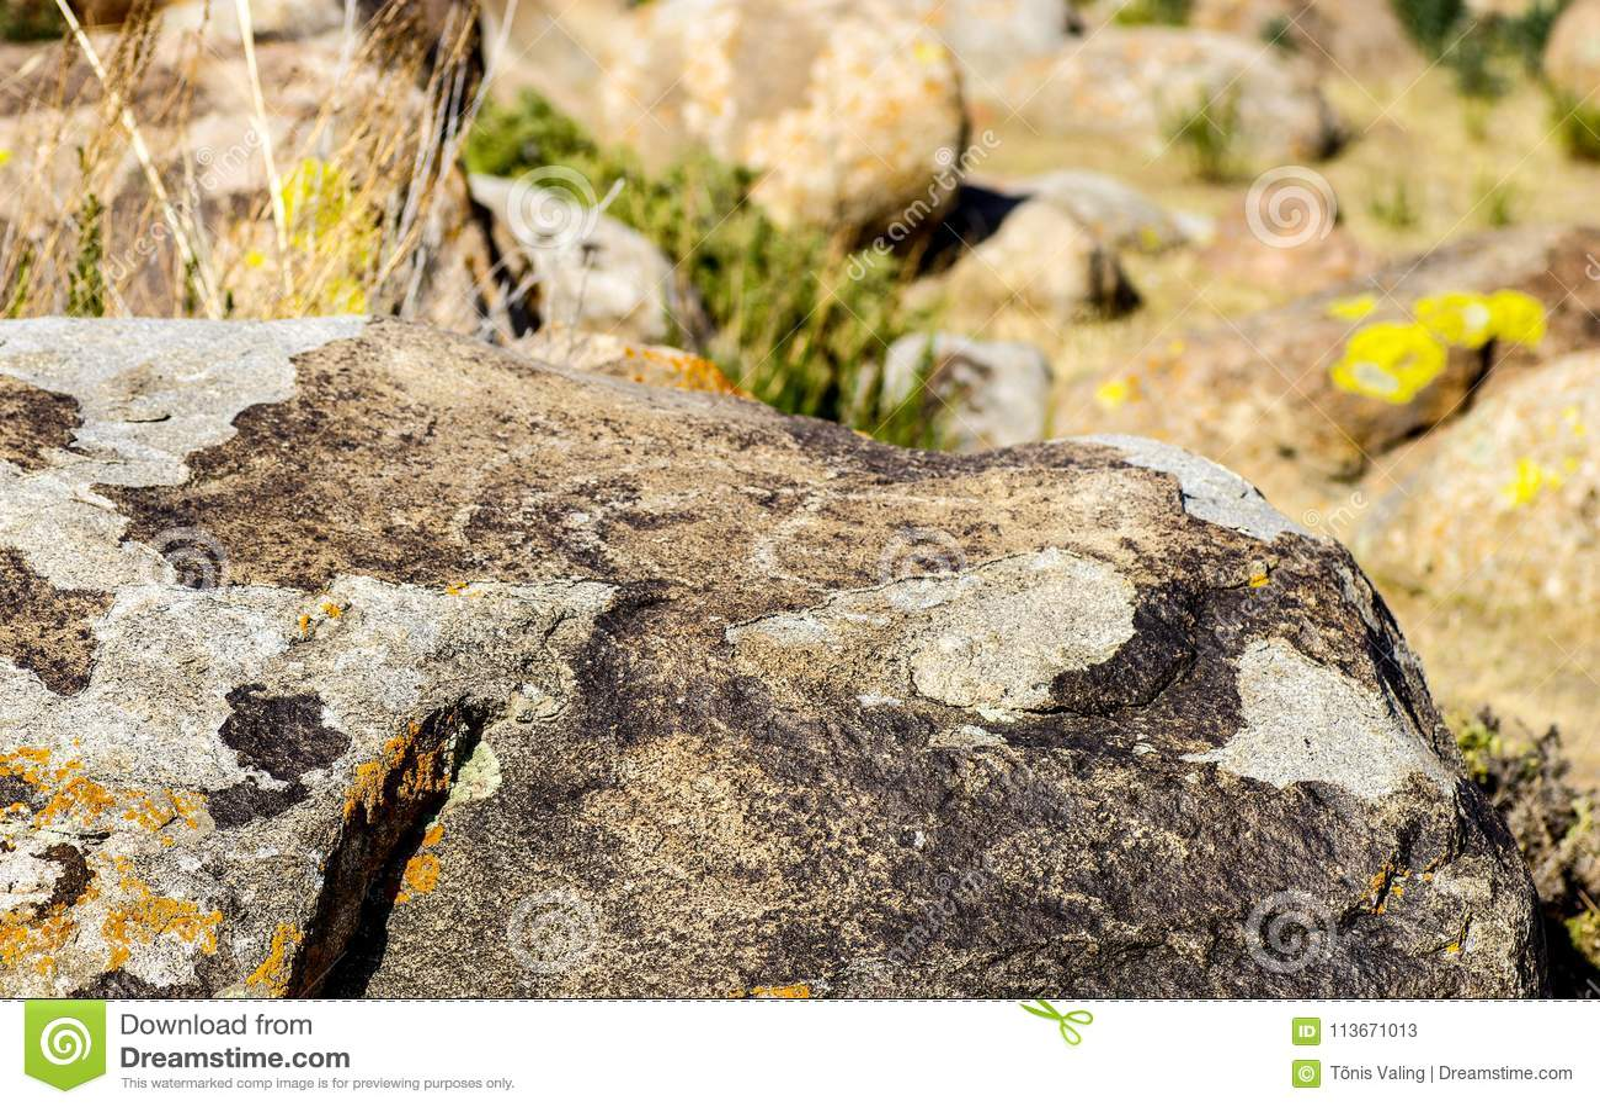 Alter Standort mit historischen Petroglyphen in Kirgisistan